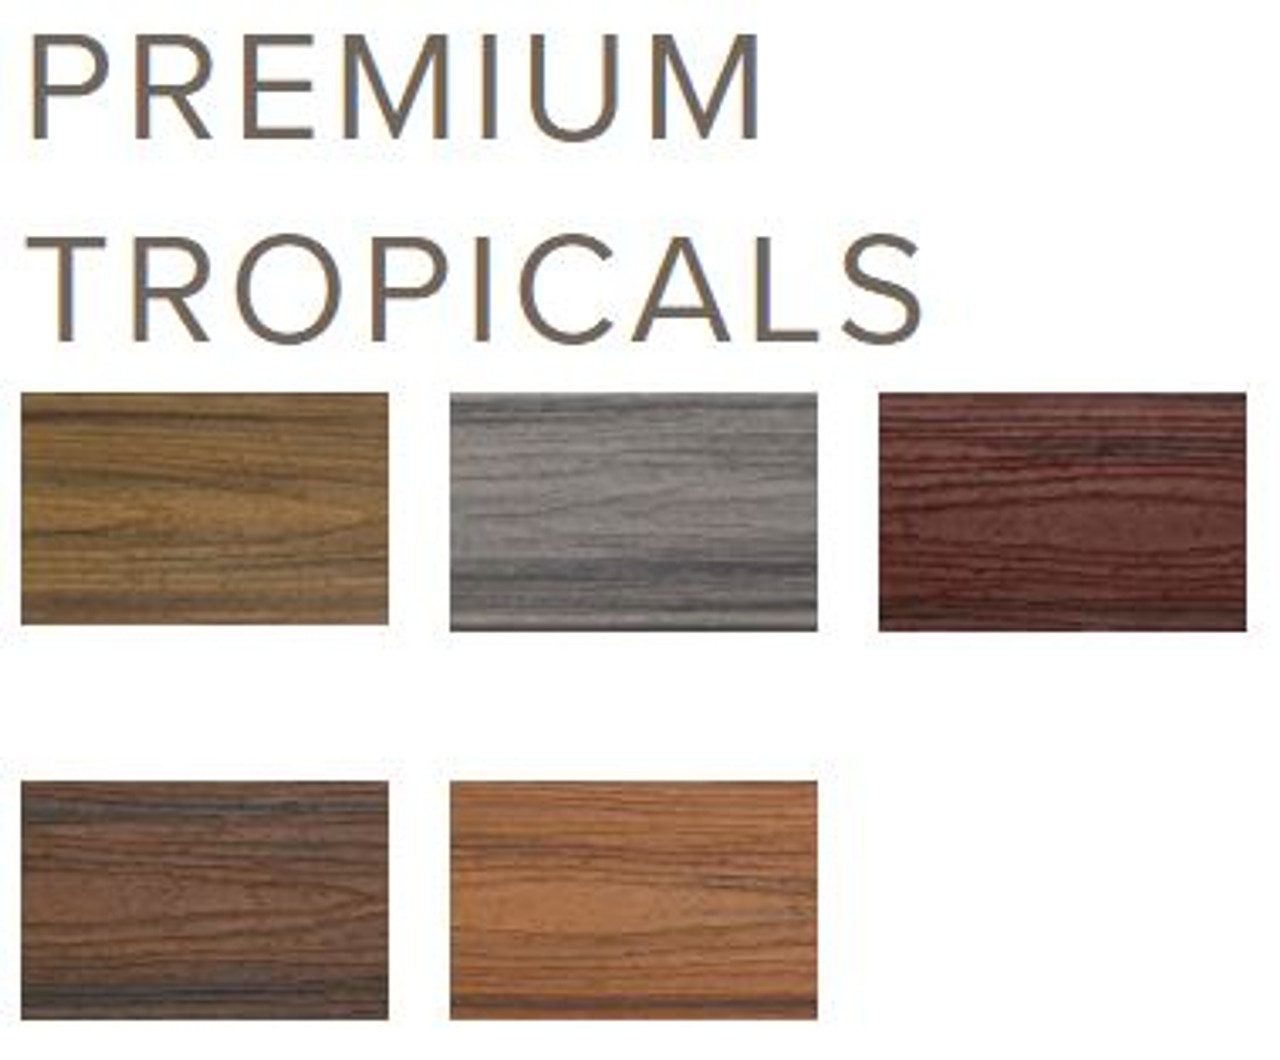 Trex Transcend Tropical Collection Colors